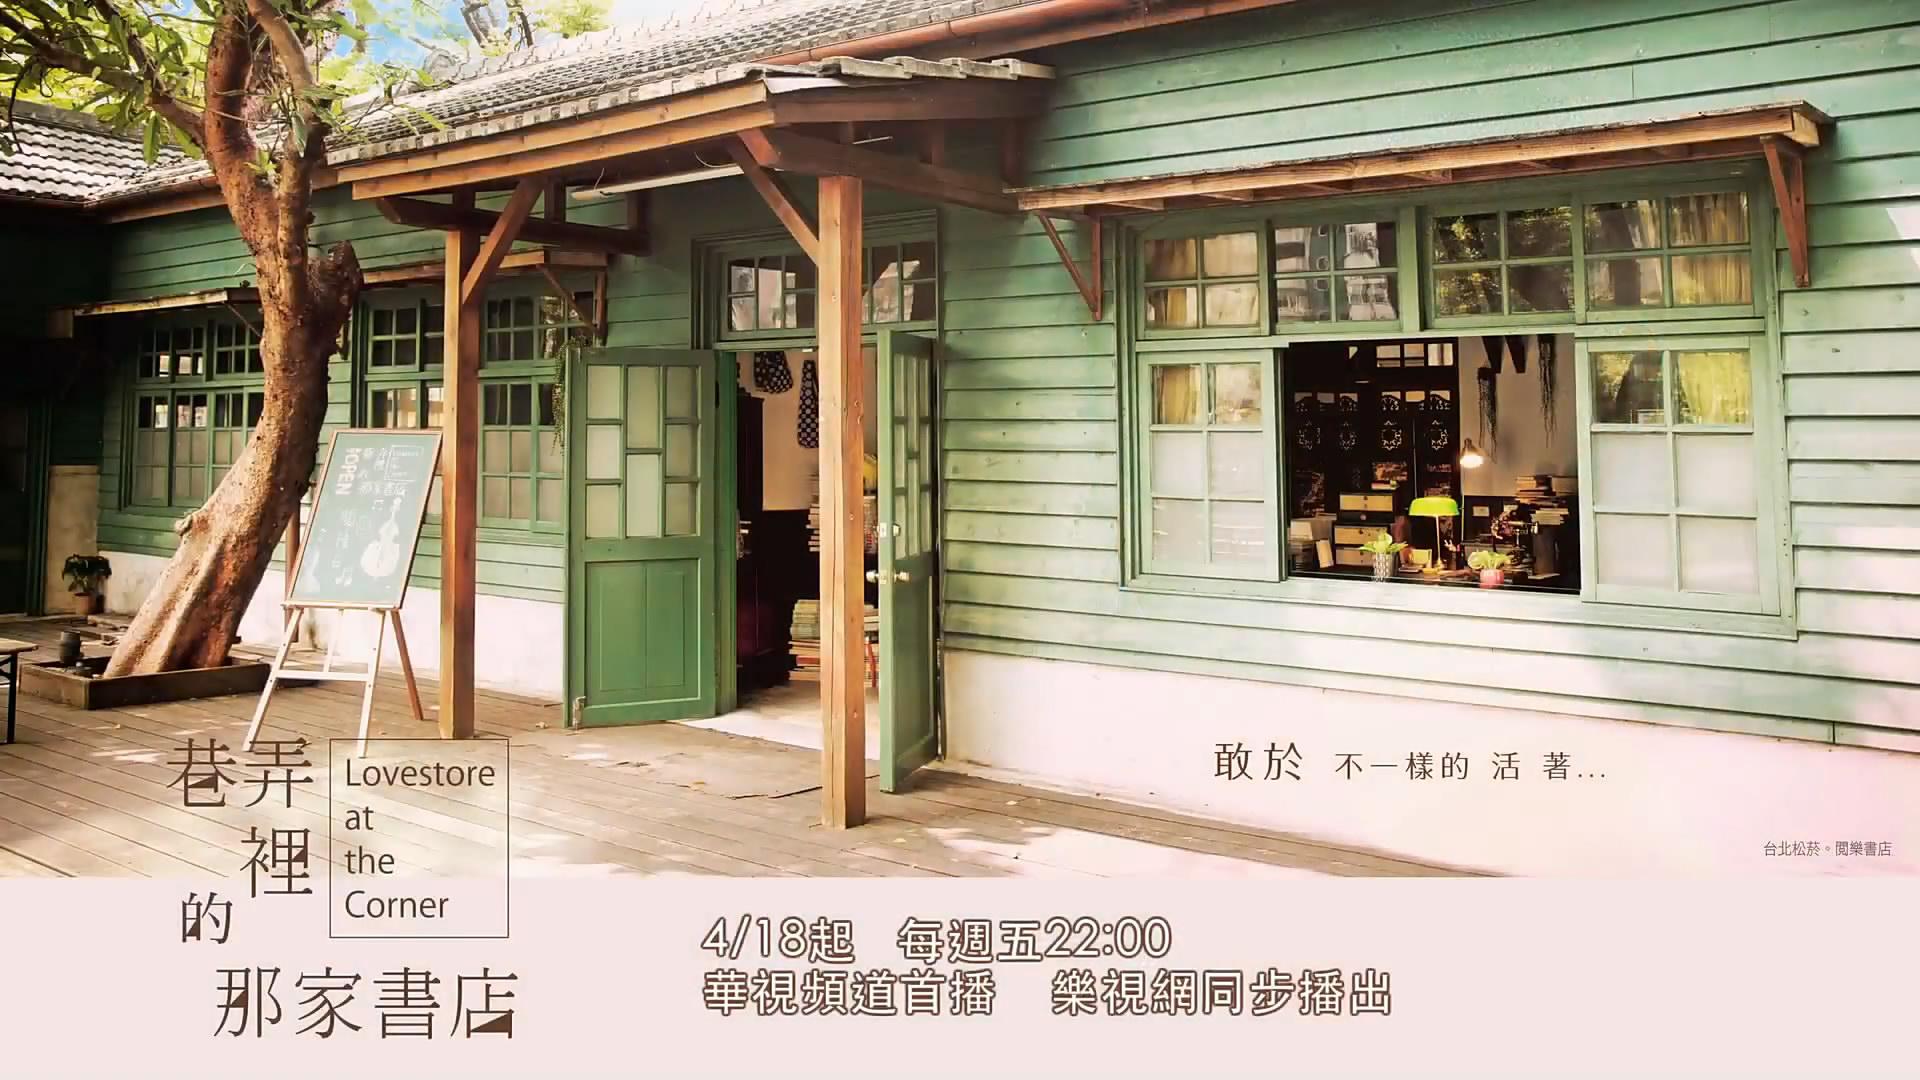 Lovestore at the Corner - 巷弄裡的那家書店